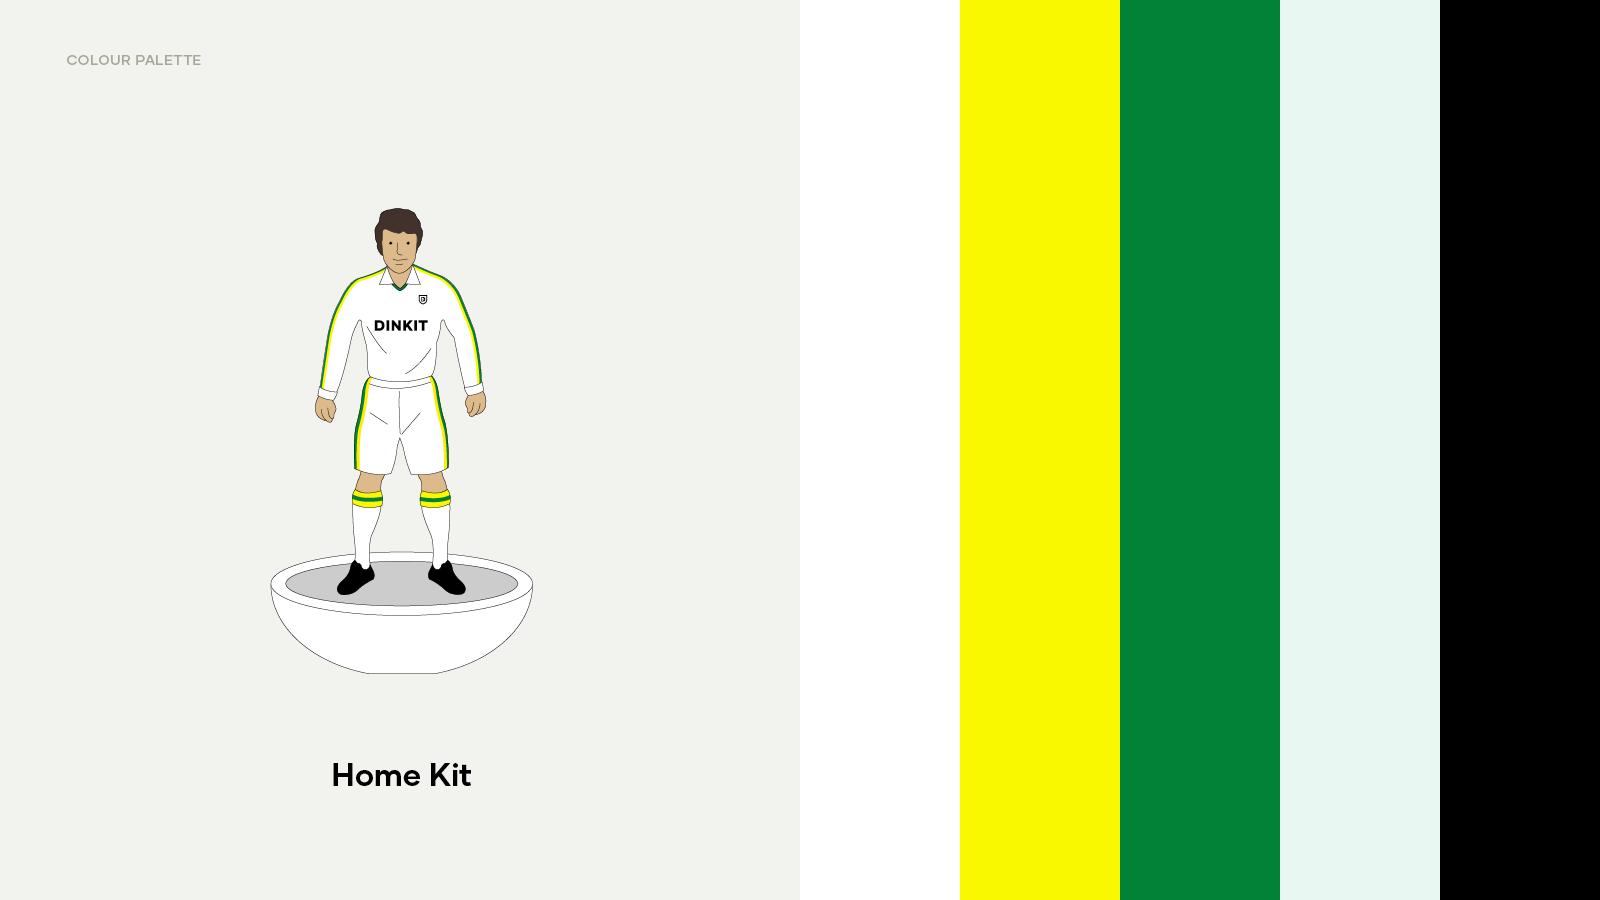 branding-identity-design-sport-football-graphics-dinkit-artwork-prints-posters-gallery-milton-keynes-london-7b